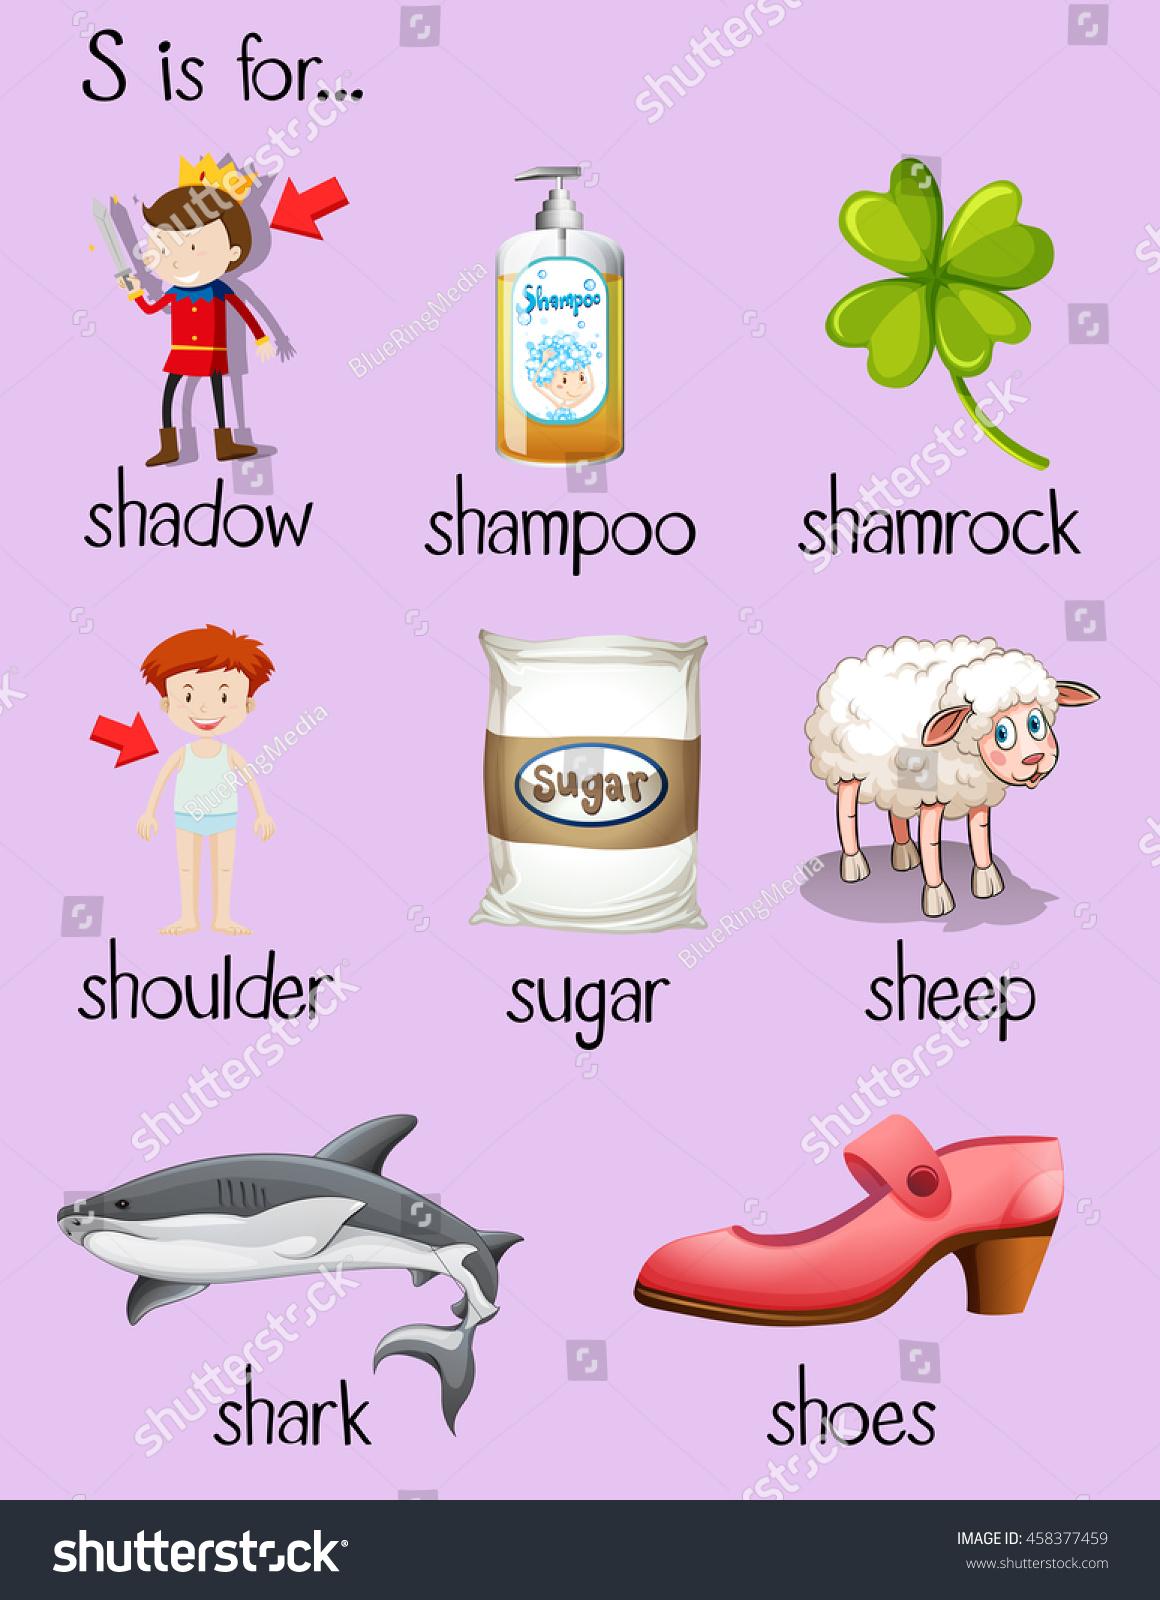 Many Words Begin Letter S Illustration Stock Vector (Royalty Free ...